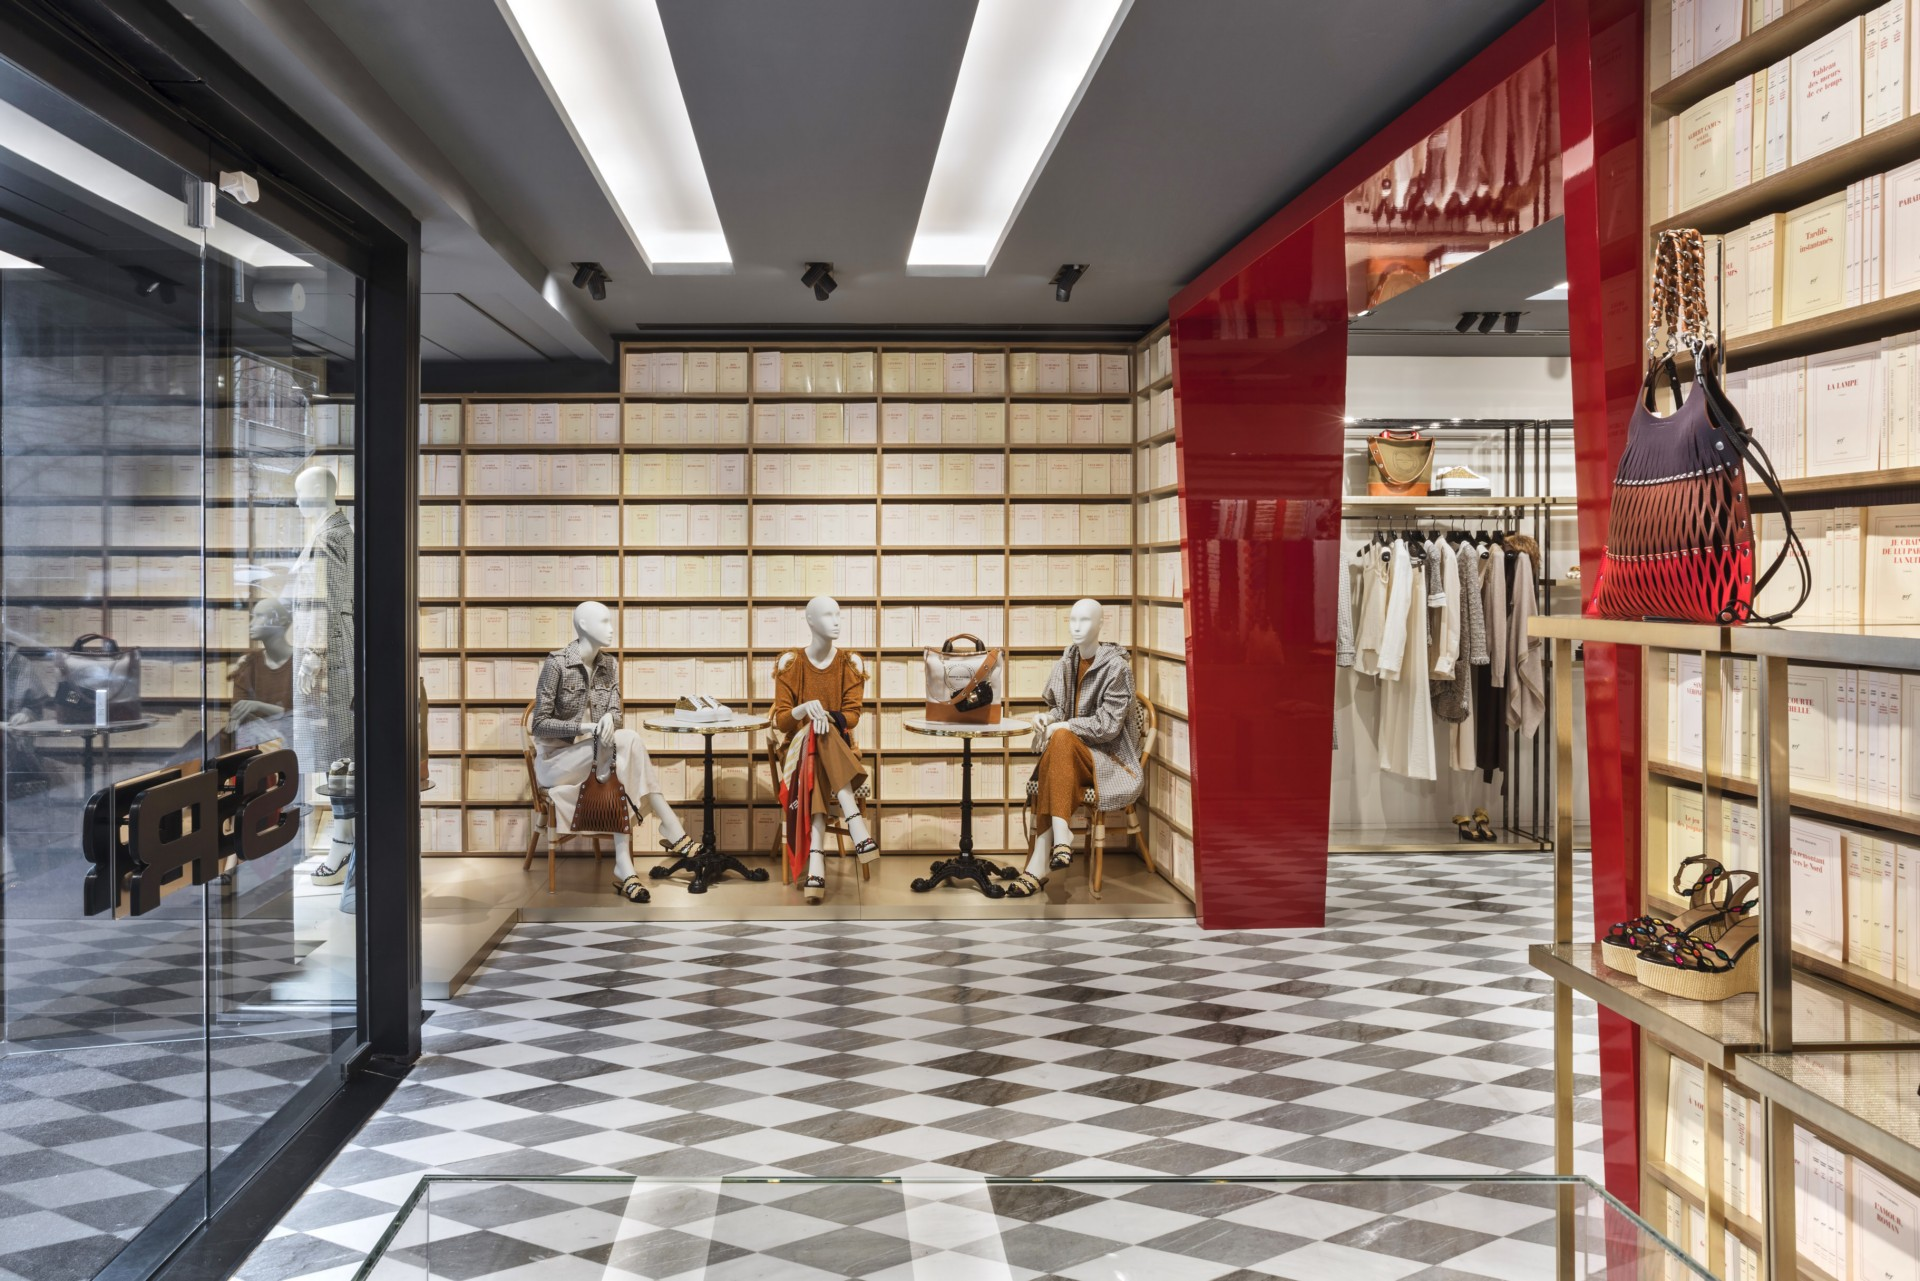 Architettura A Madrid vudafierisaverino partners boutique architettura e moda a